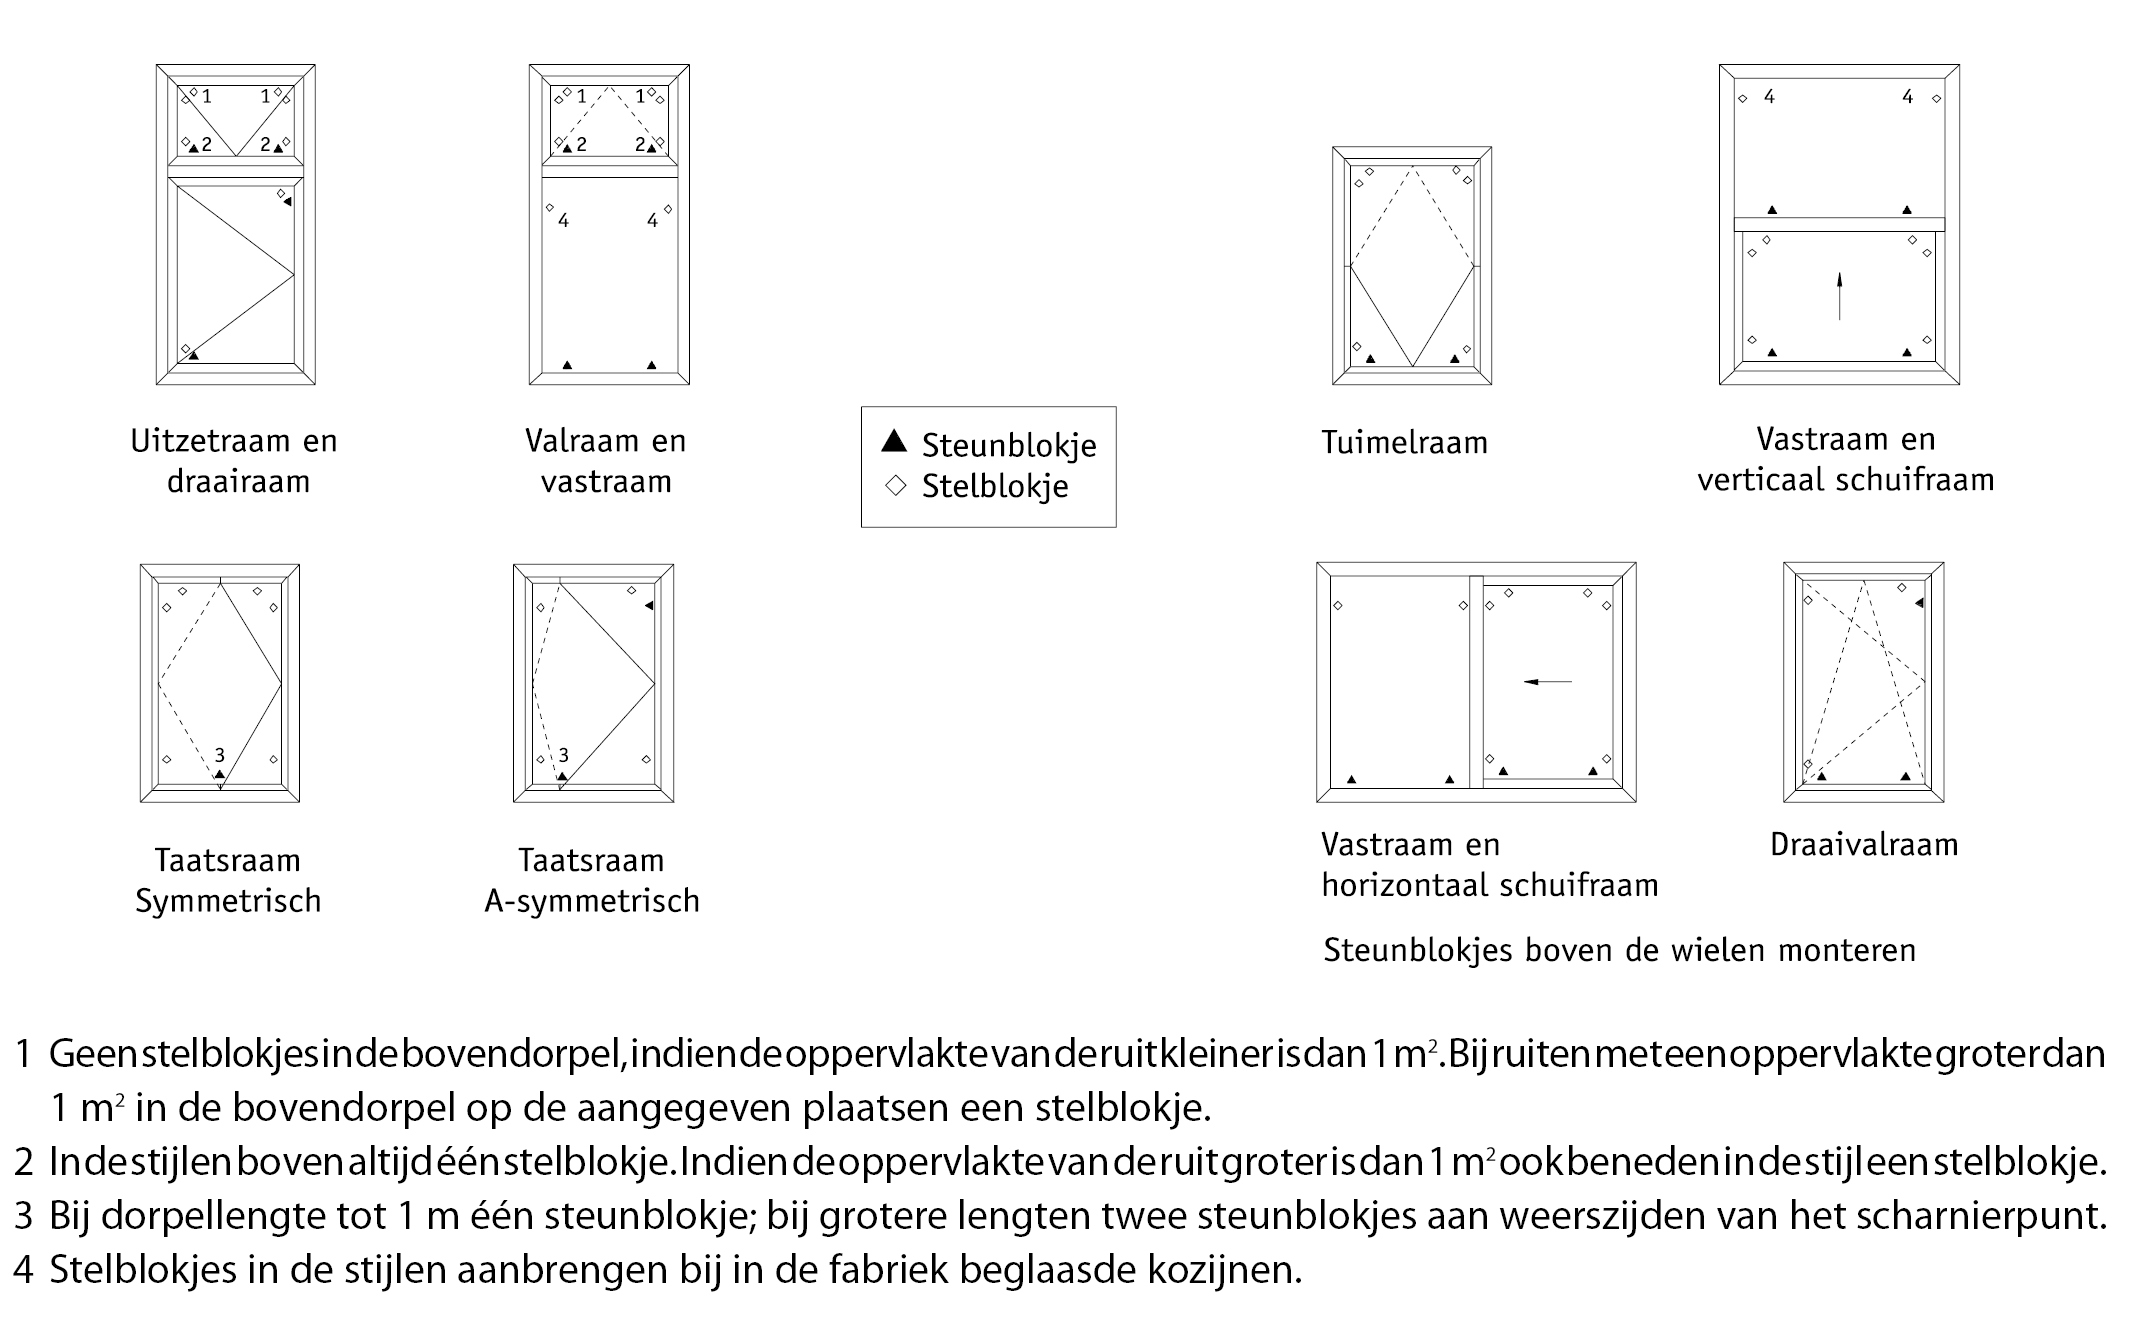 7.7 Staal_Glasvulling_Steunblokjes.jpg